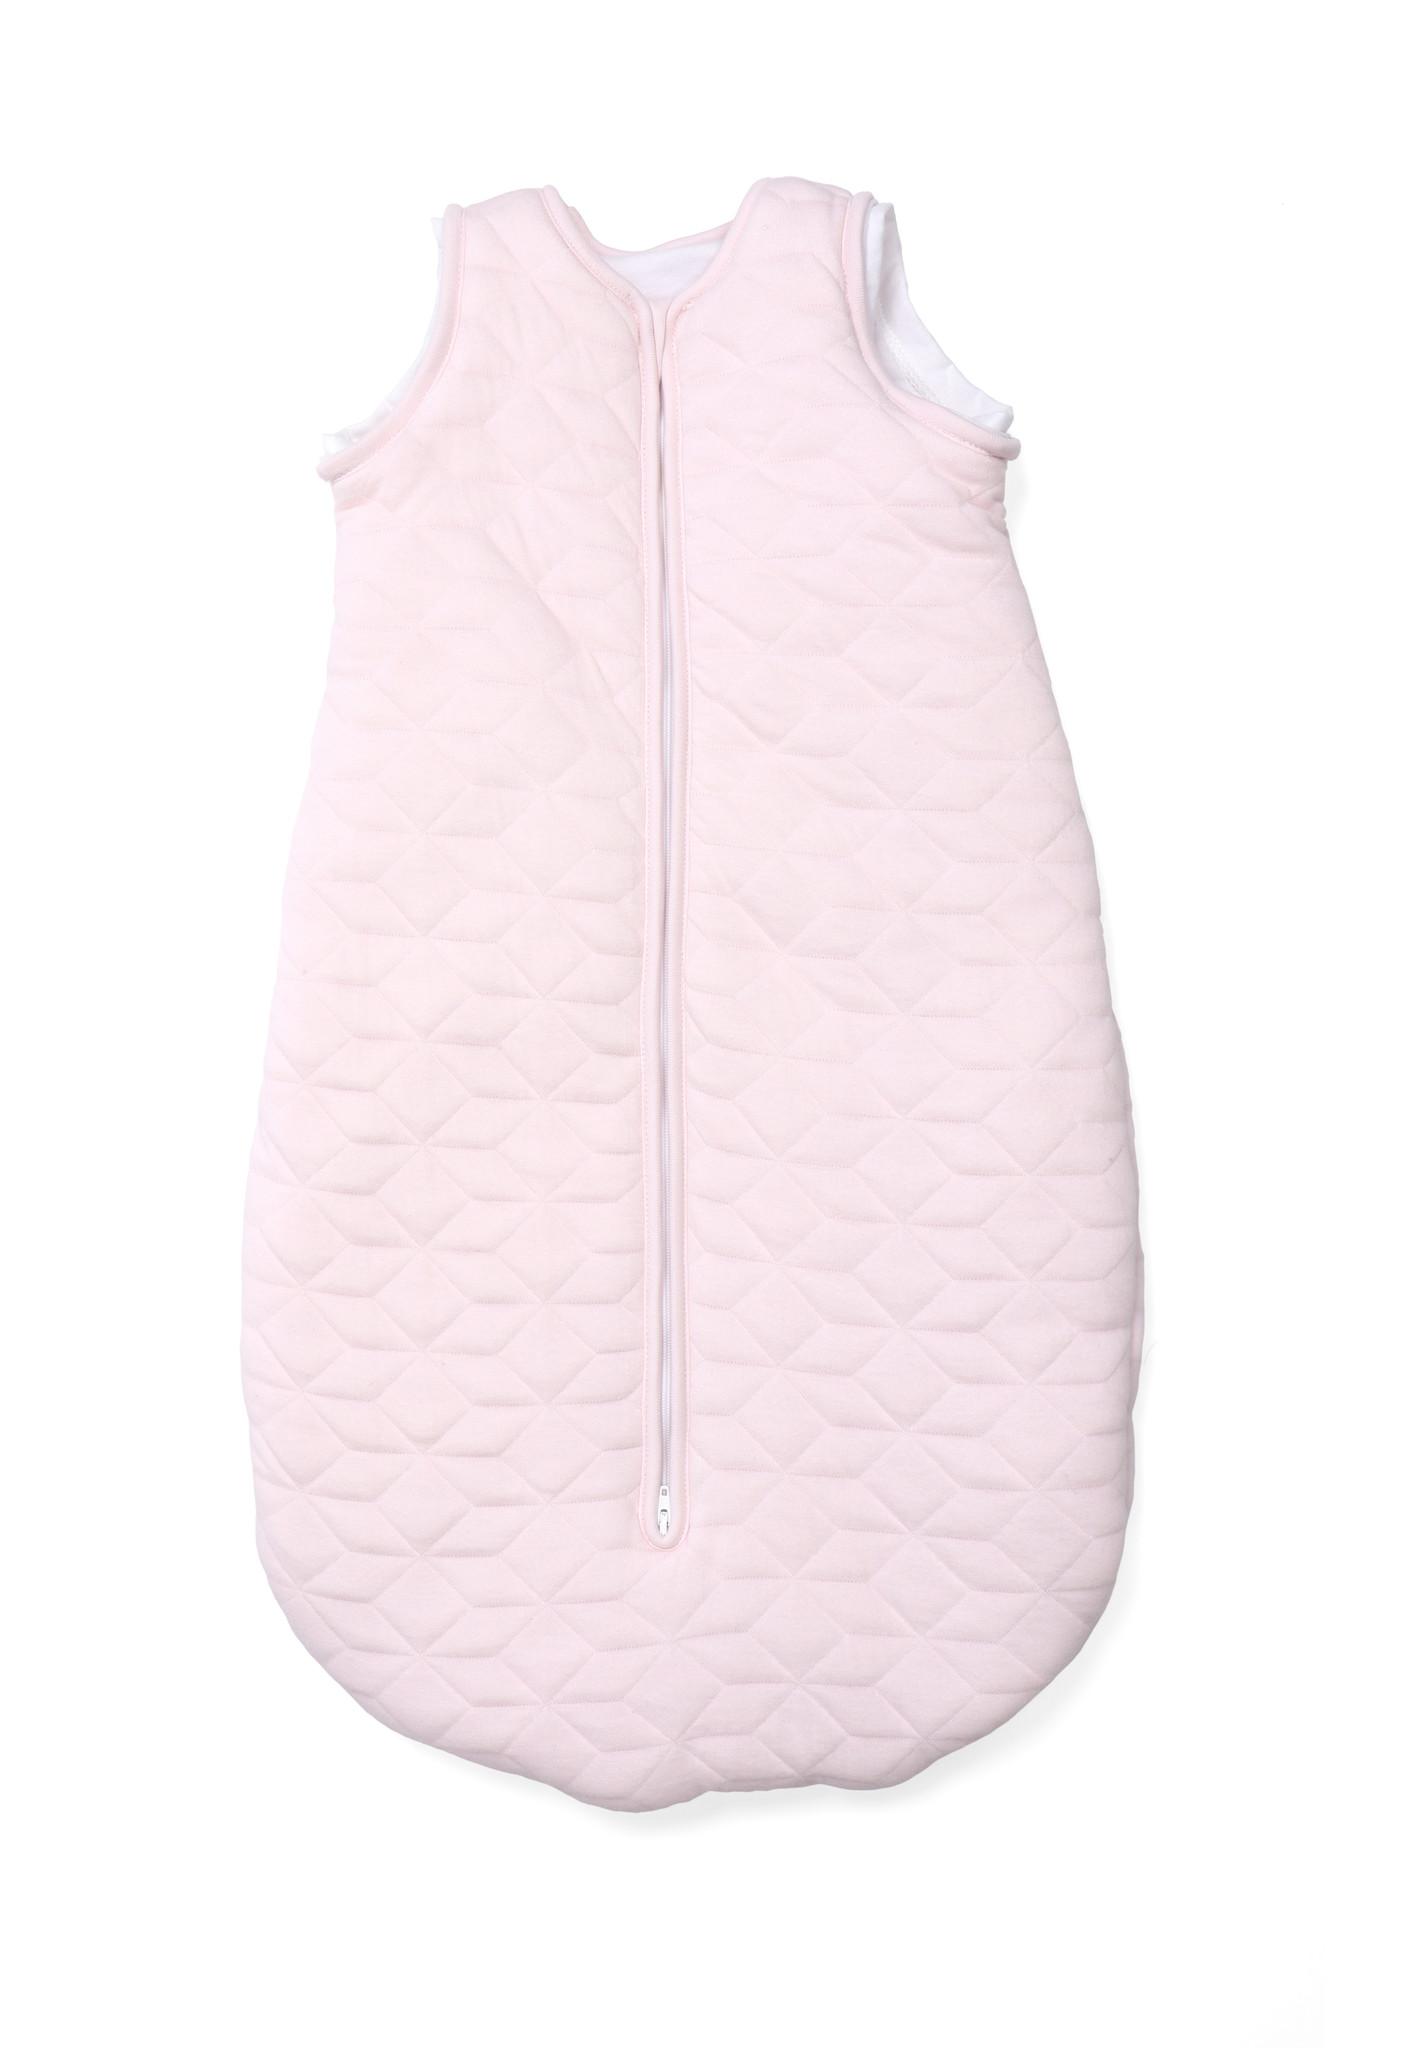 Jersey slaapzak 90cm met afritsbare mouwen Star Soft Pink-3